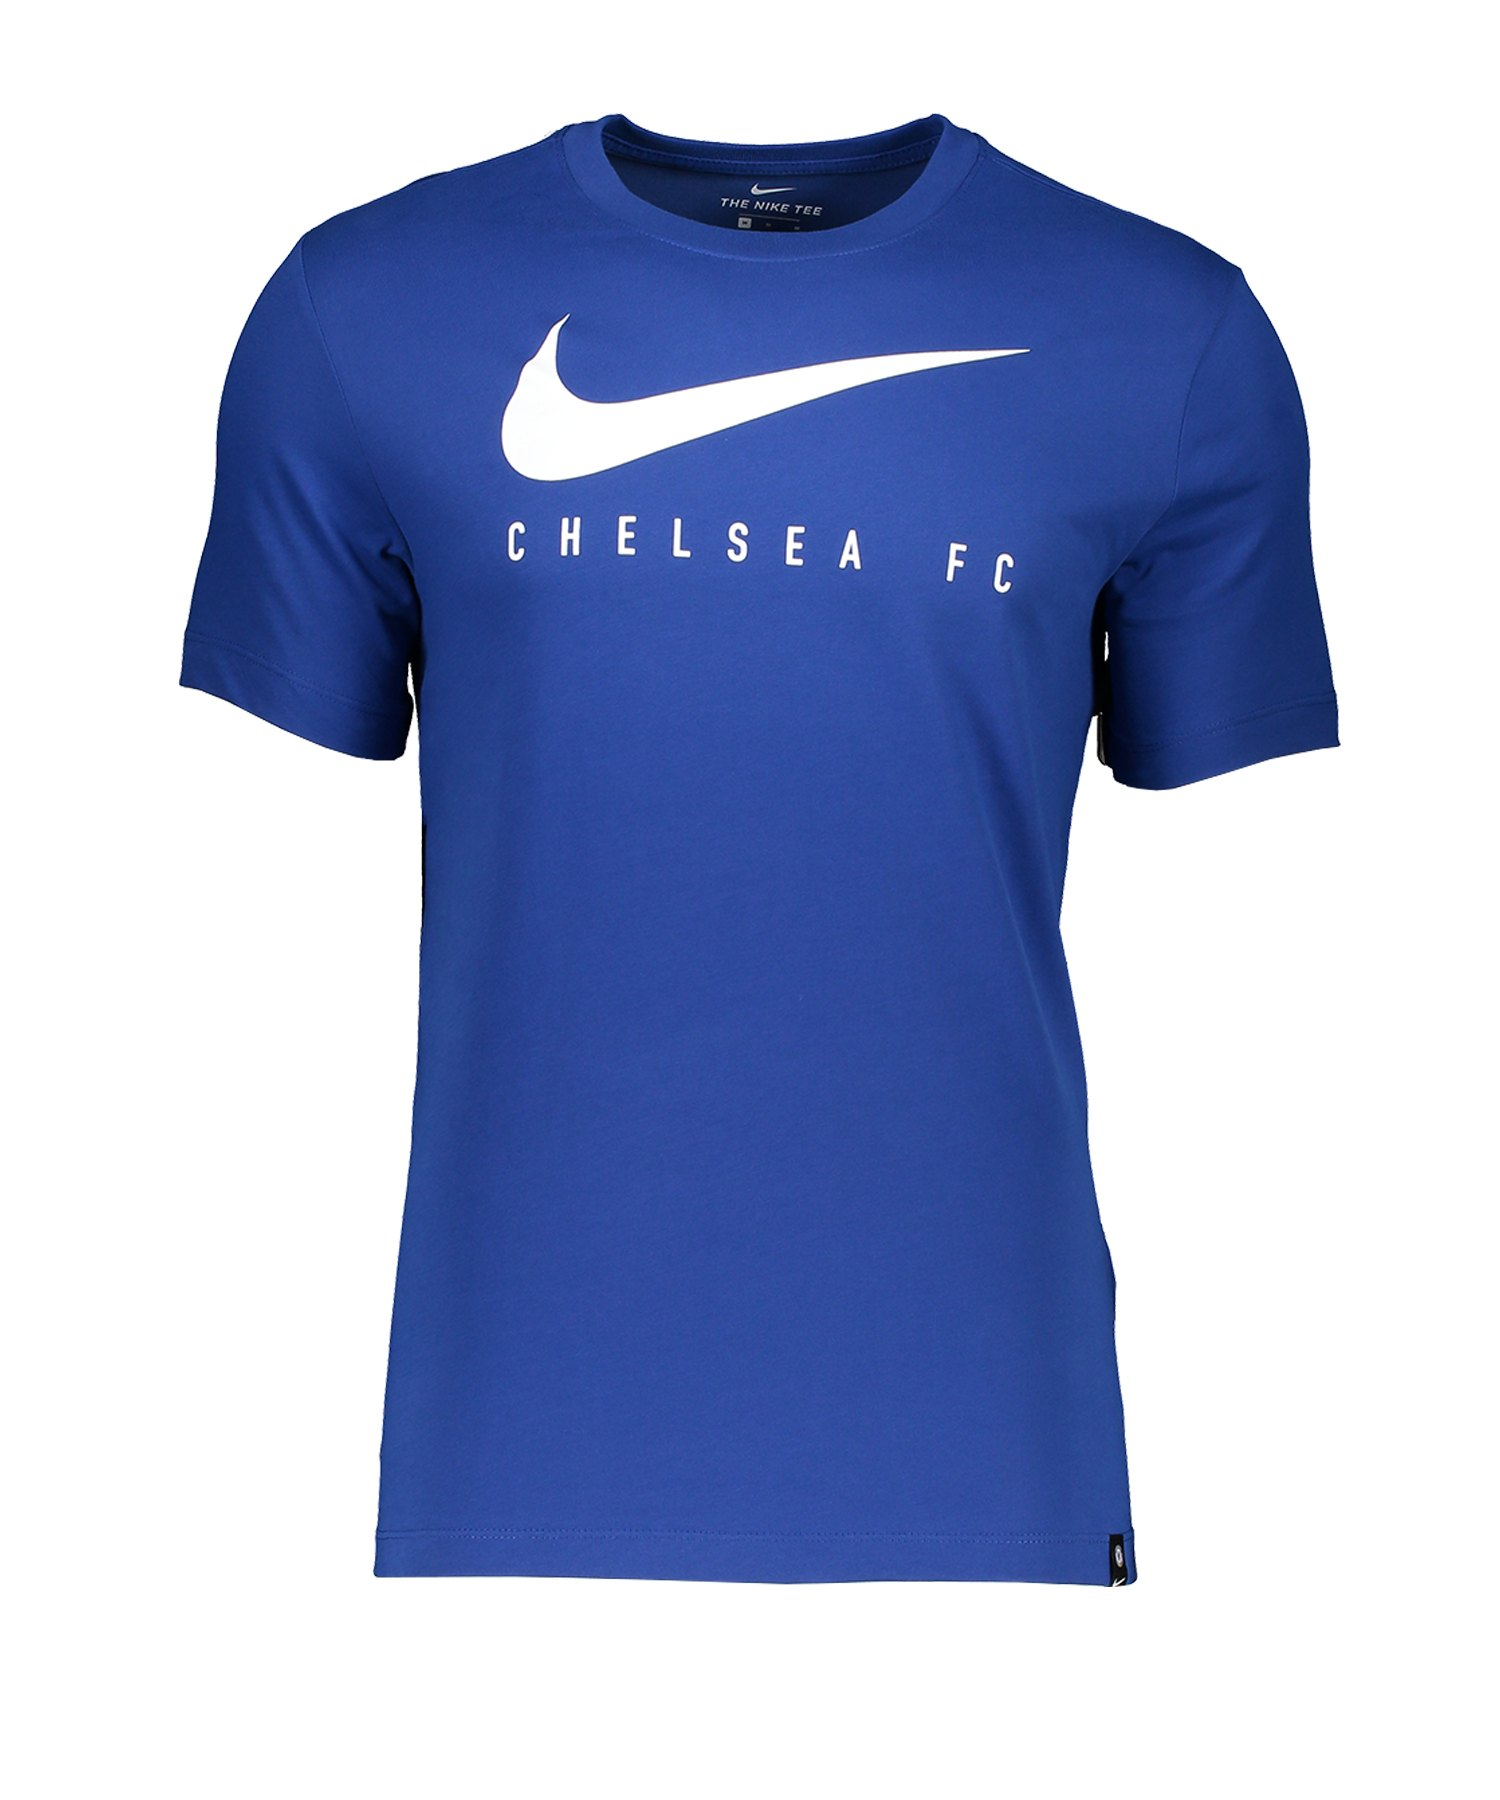 Nike FC Chelsea London Ground T-Shirt Blau F495 - Blau